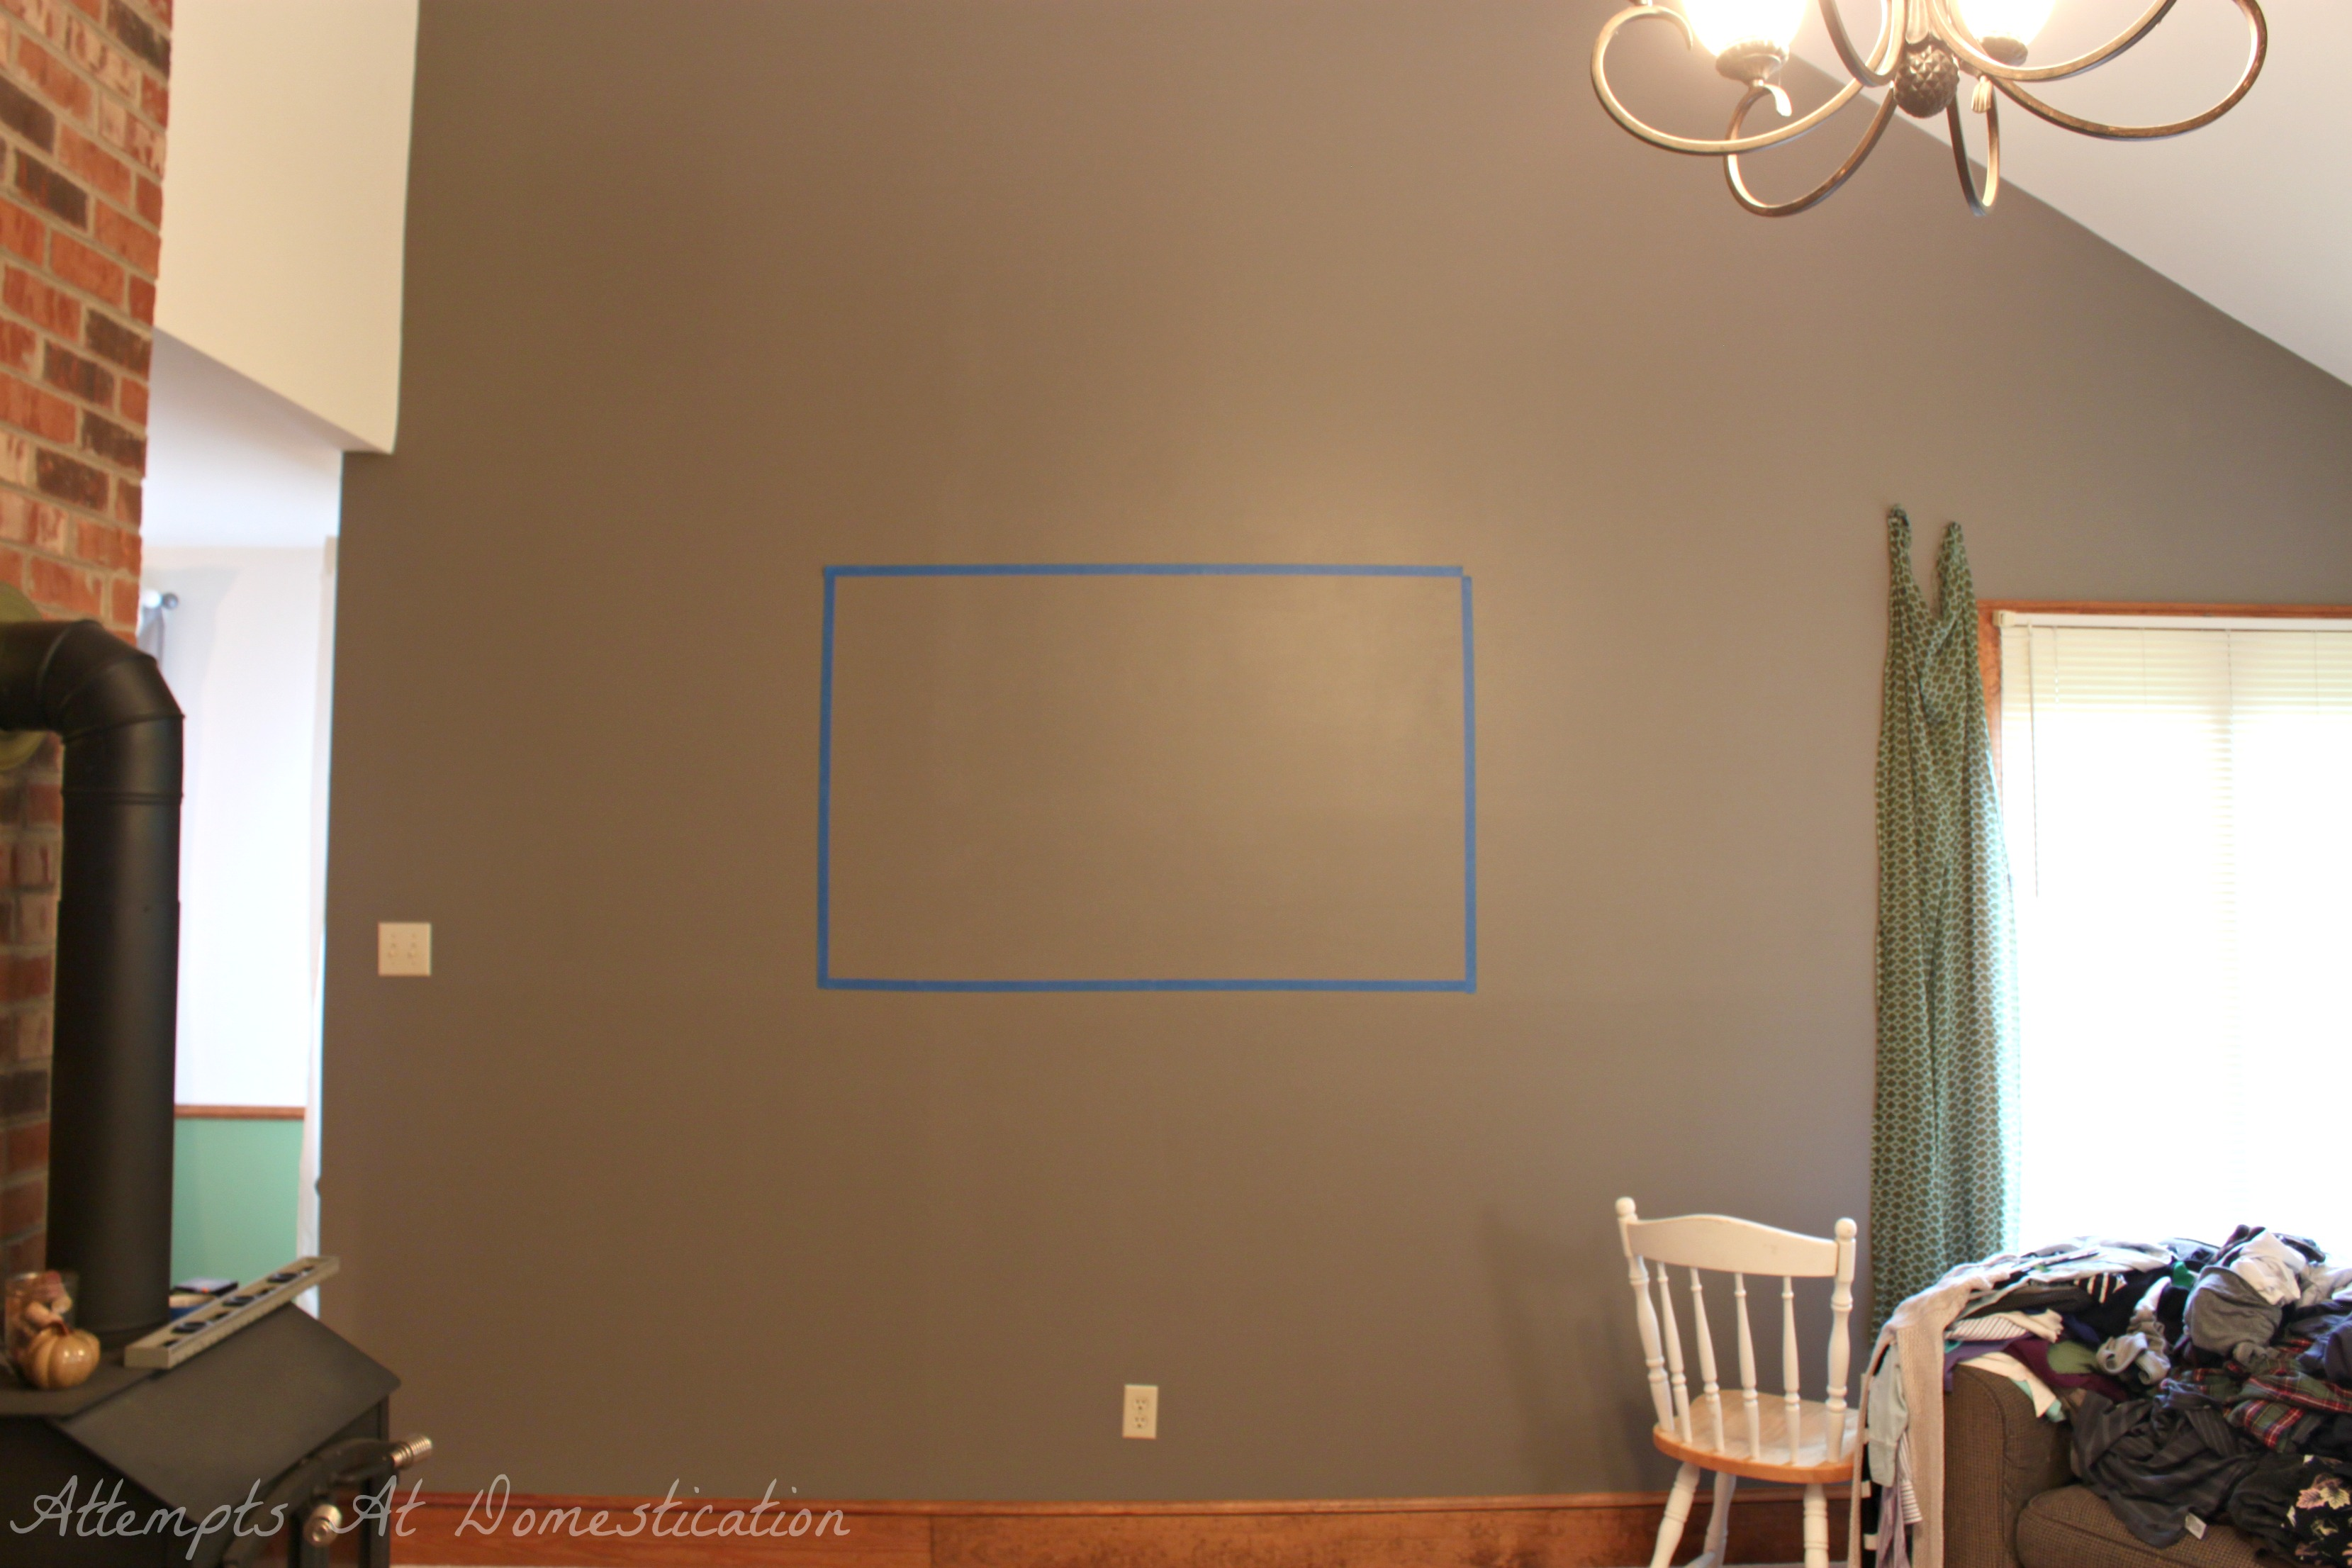 Hd Wallpapers Domestication Home Decor